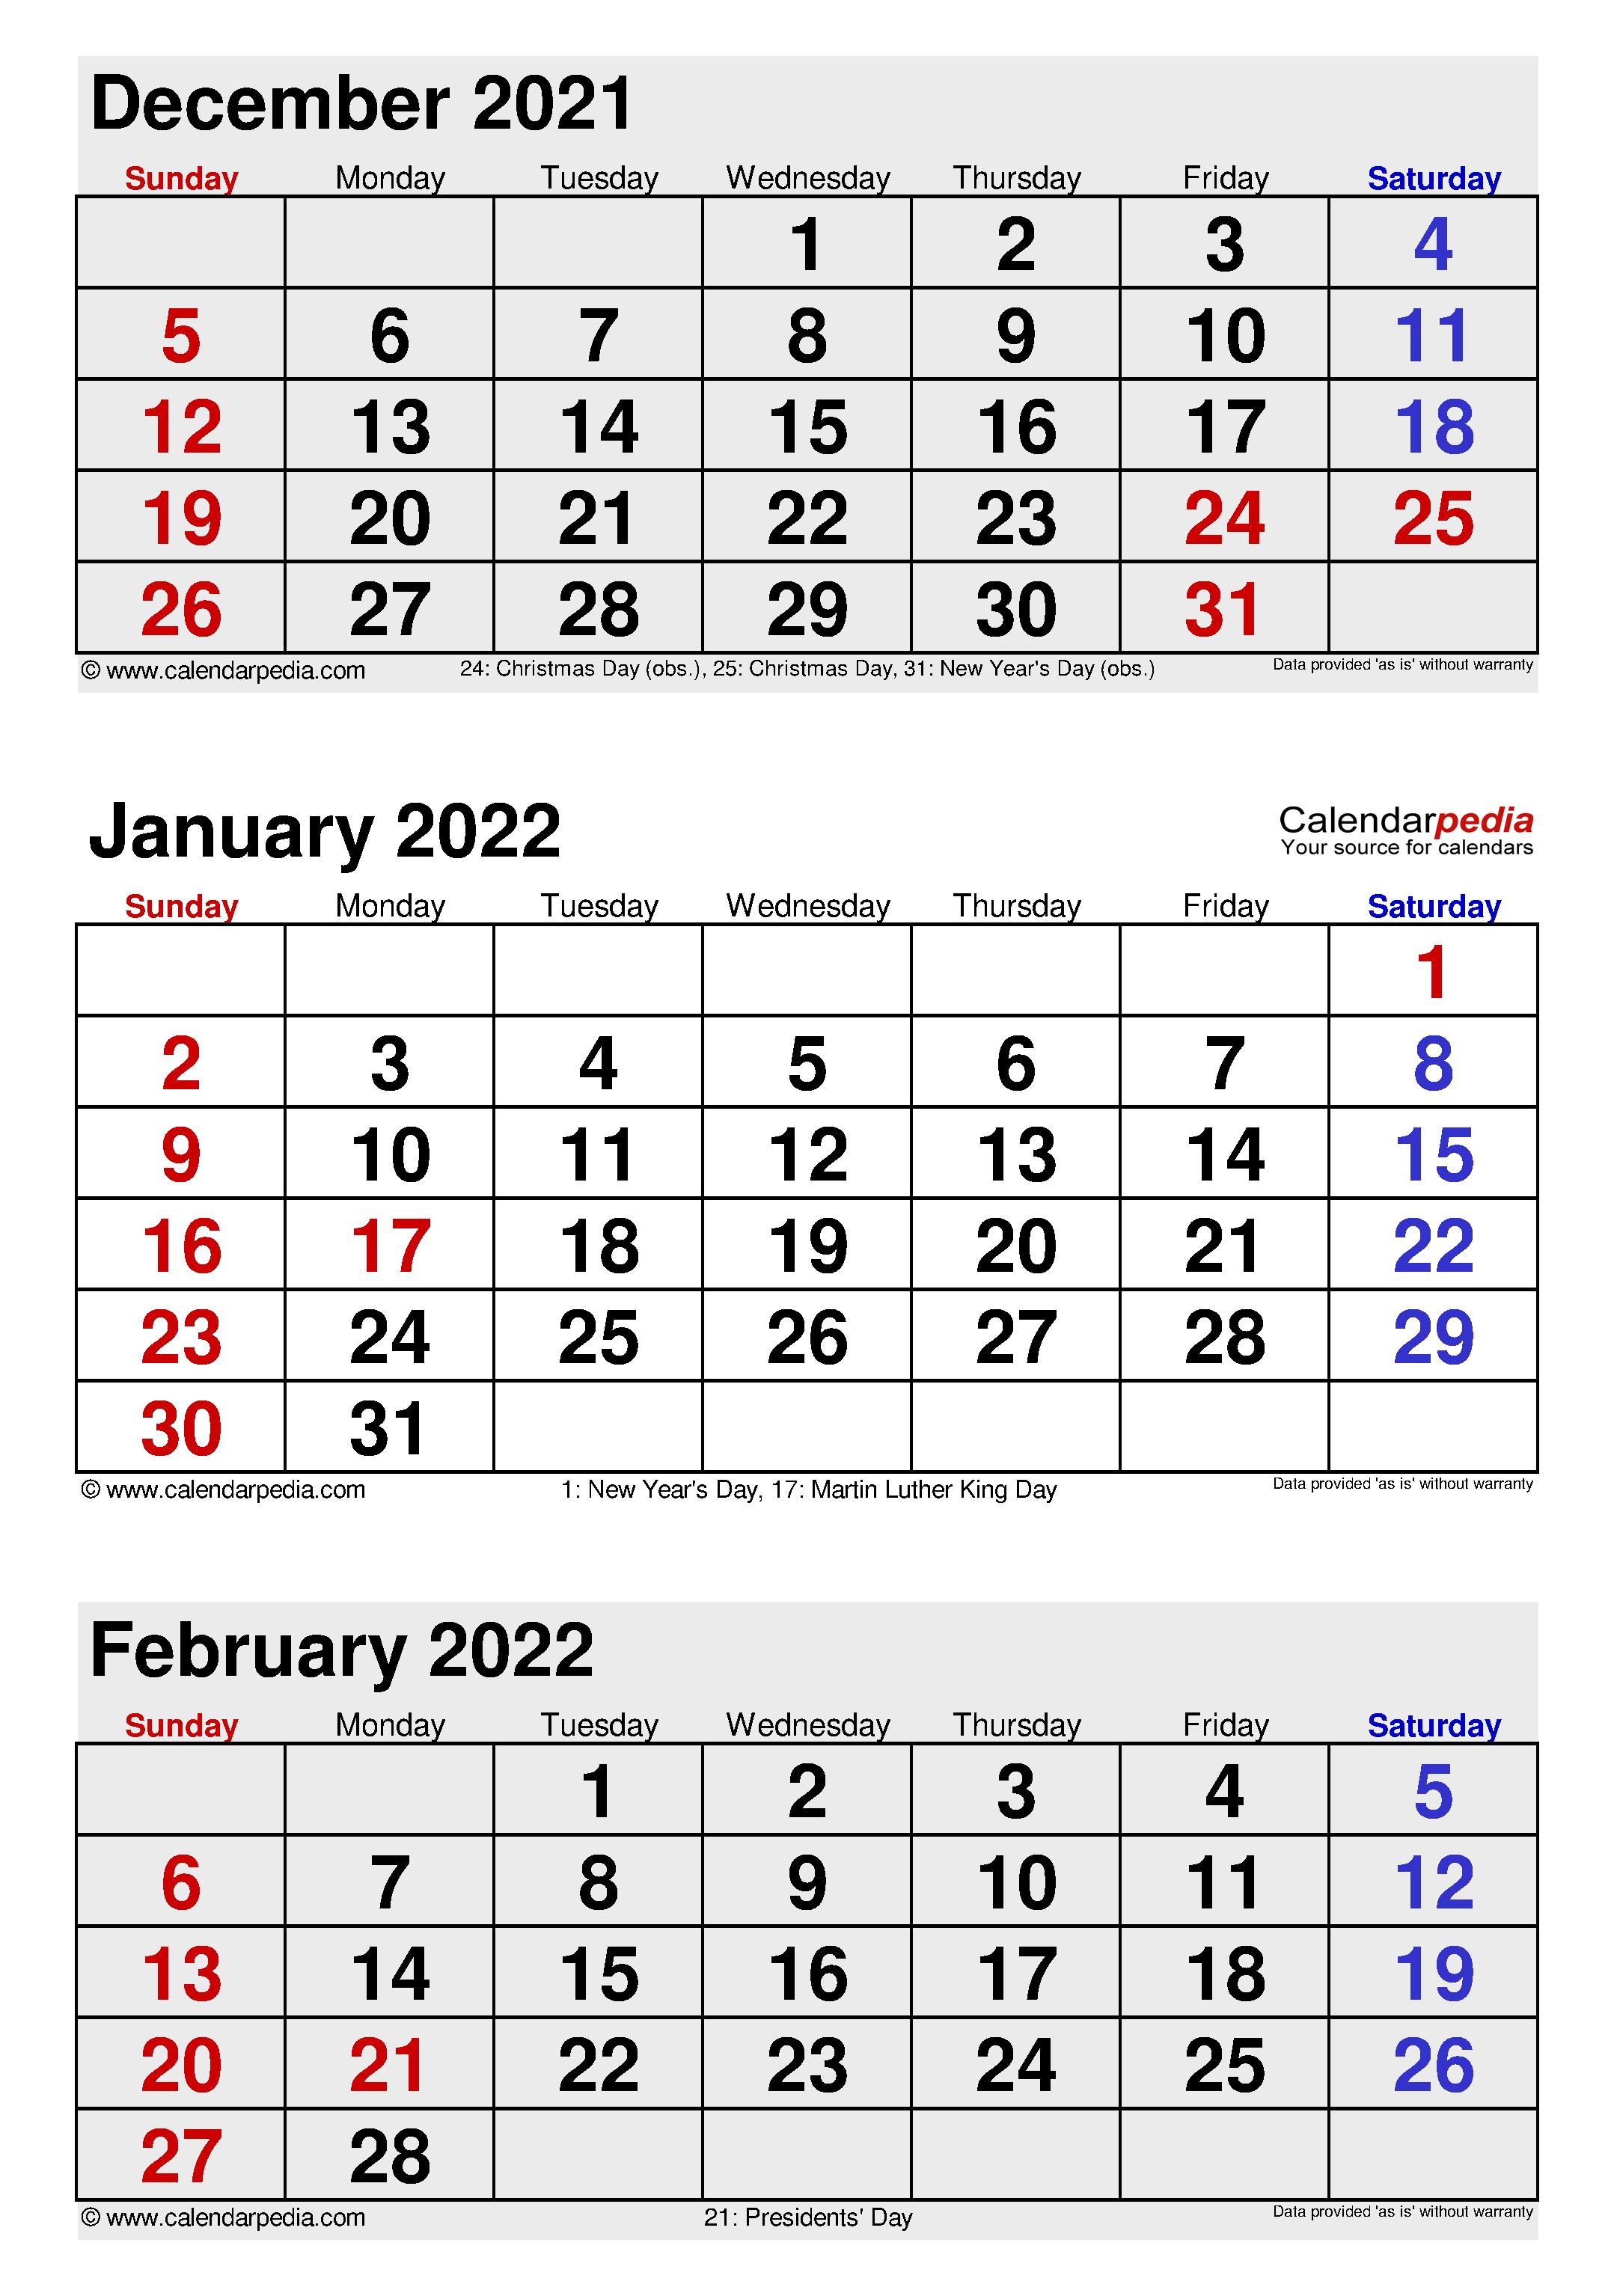 January 2022 Calendar | Templates For Word, Excel And Pdf Inside January Printable Calendar 2022